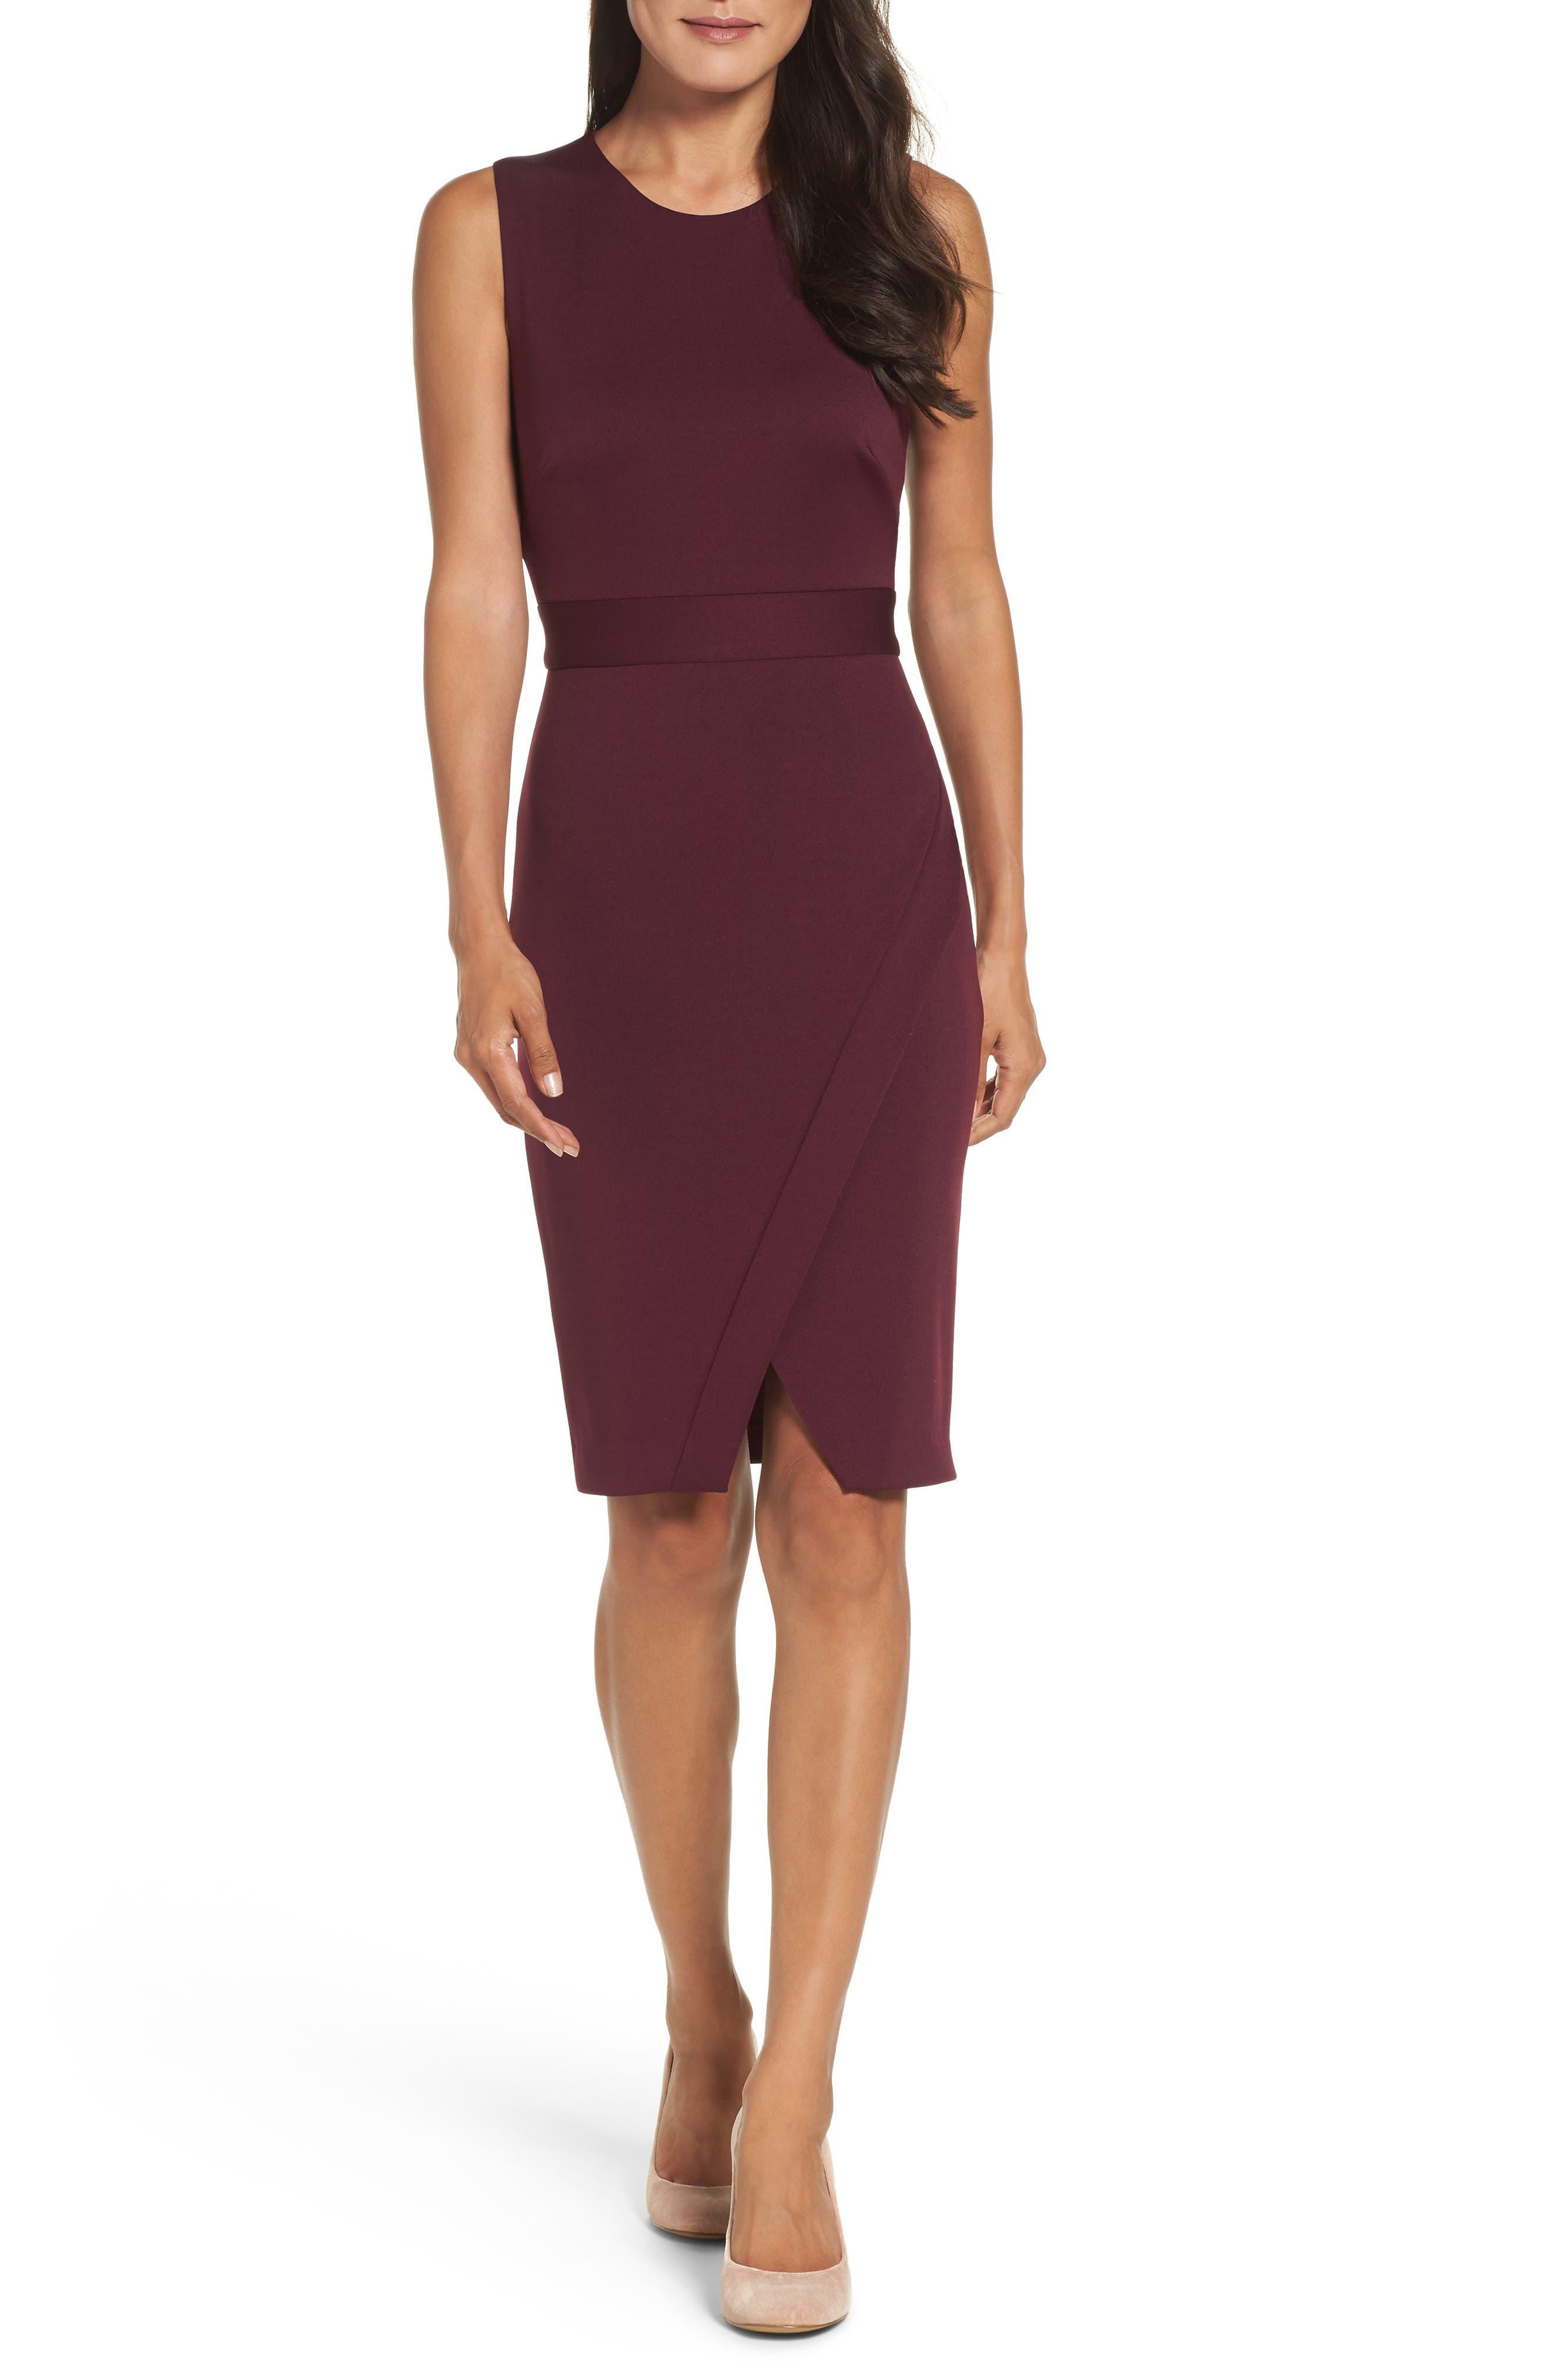 Alternate Image 1 Selected - Maggy London Scissor Sheath Dress